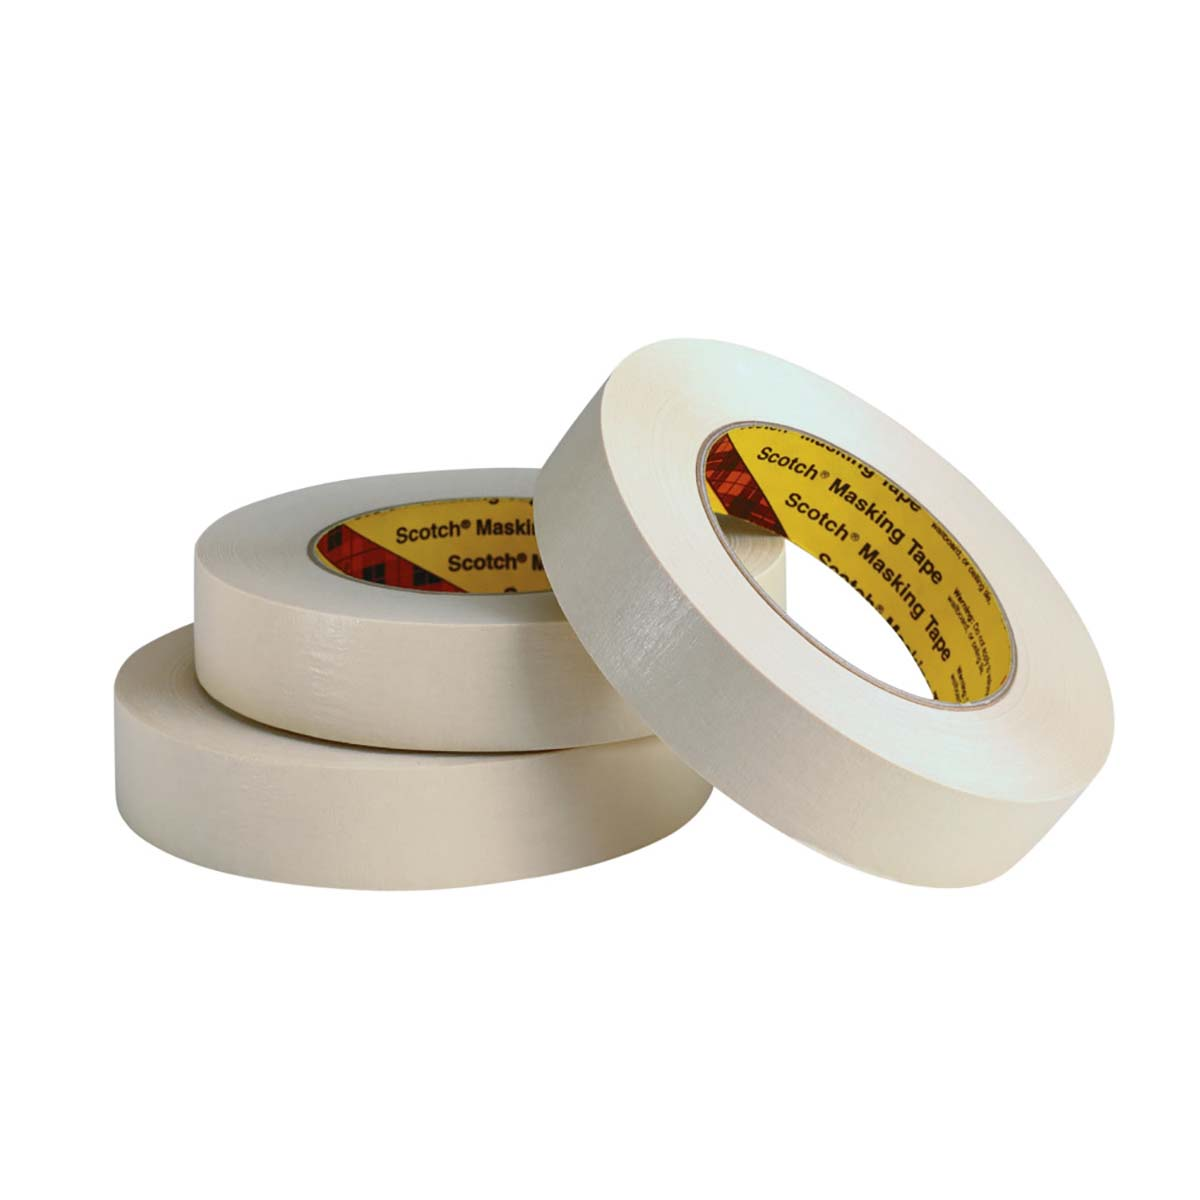 3M Paint Masking Tape 231/231A Tan, 24 mm x 55 m 7.6 mil